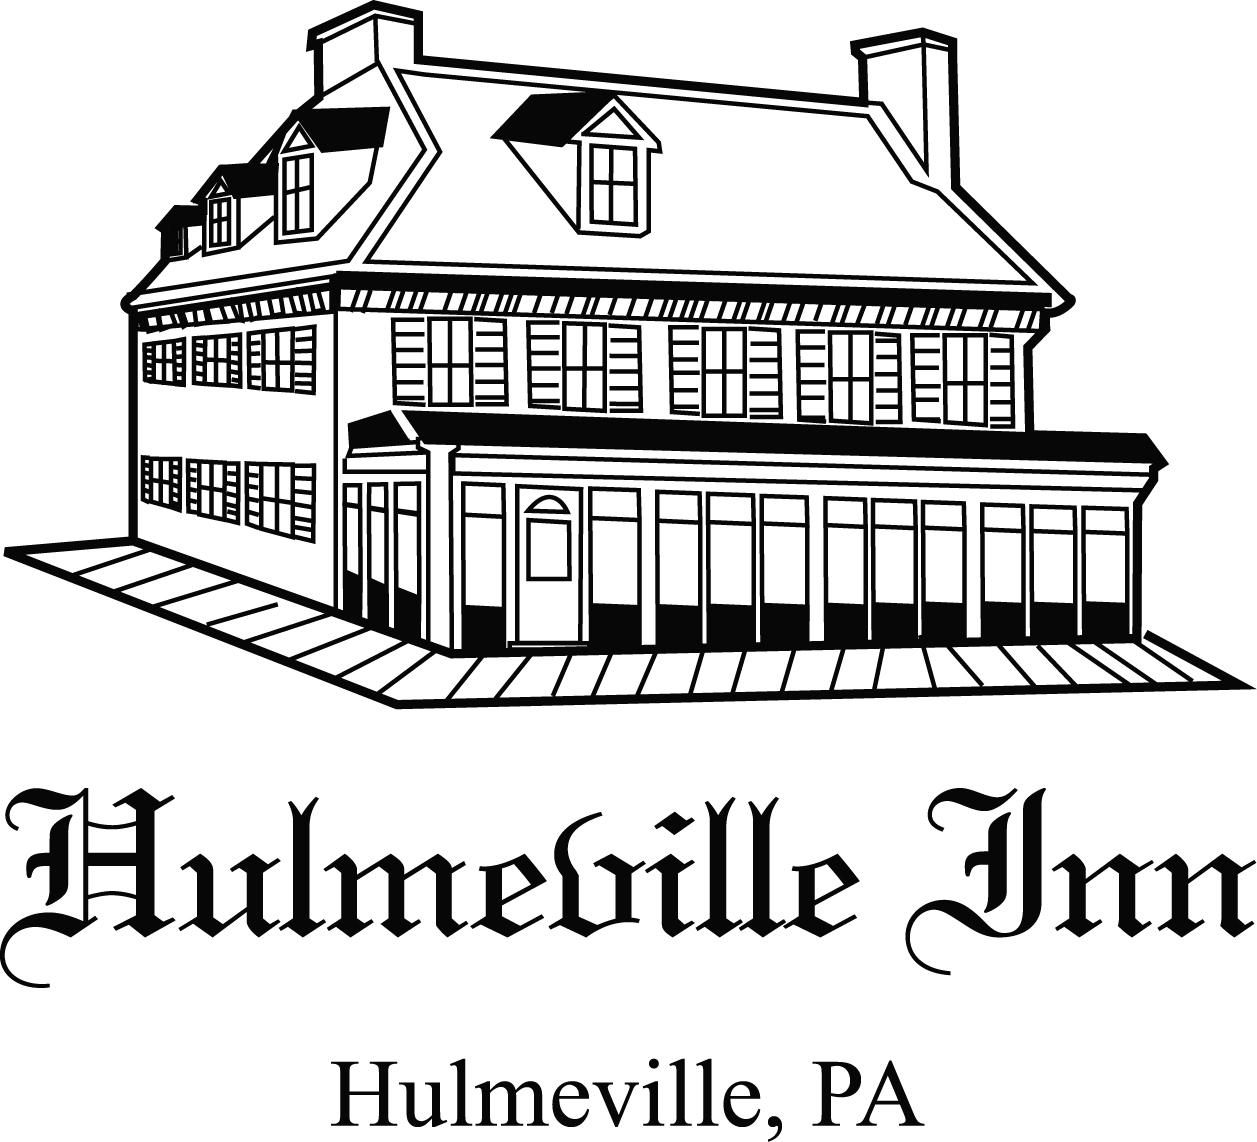 Hulmeville Inn Building